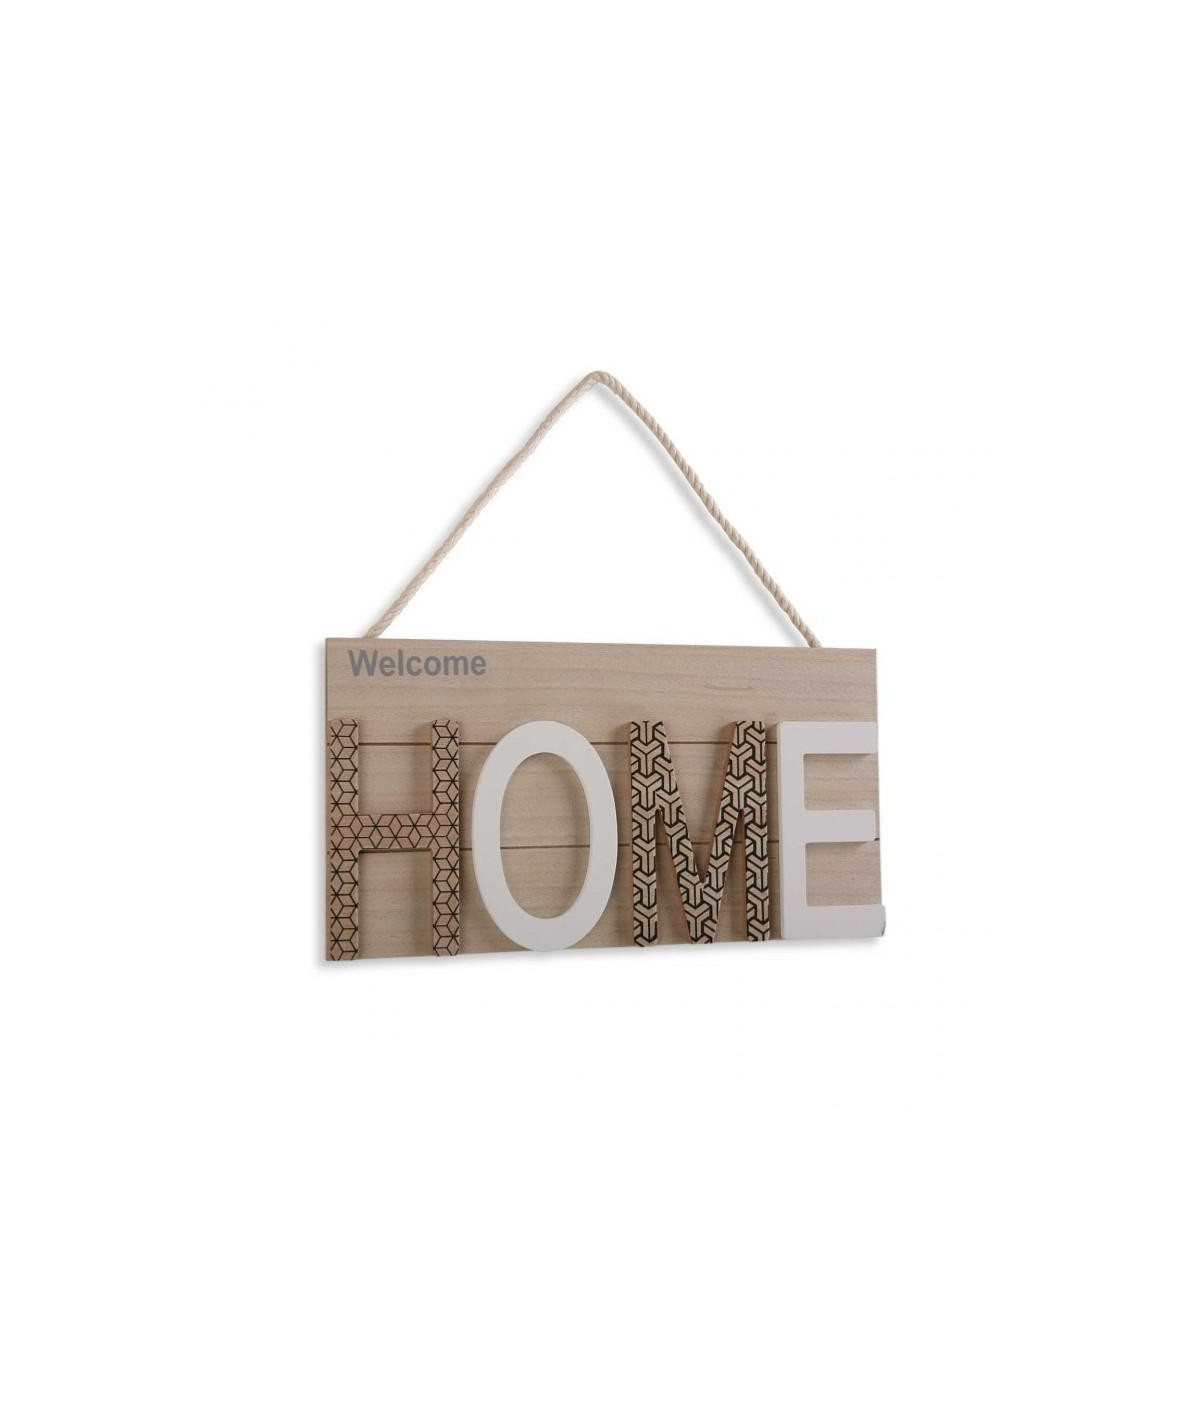 Cadre en bois clair avec corde 38x20cm - Home  YESDEKO